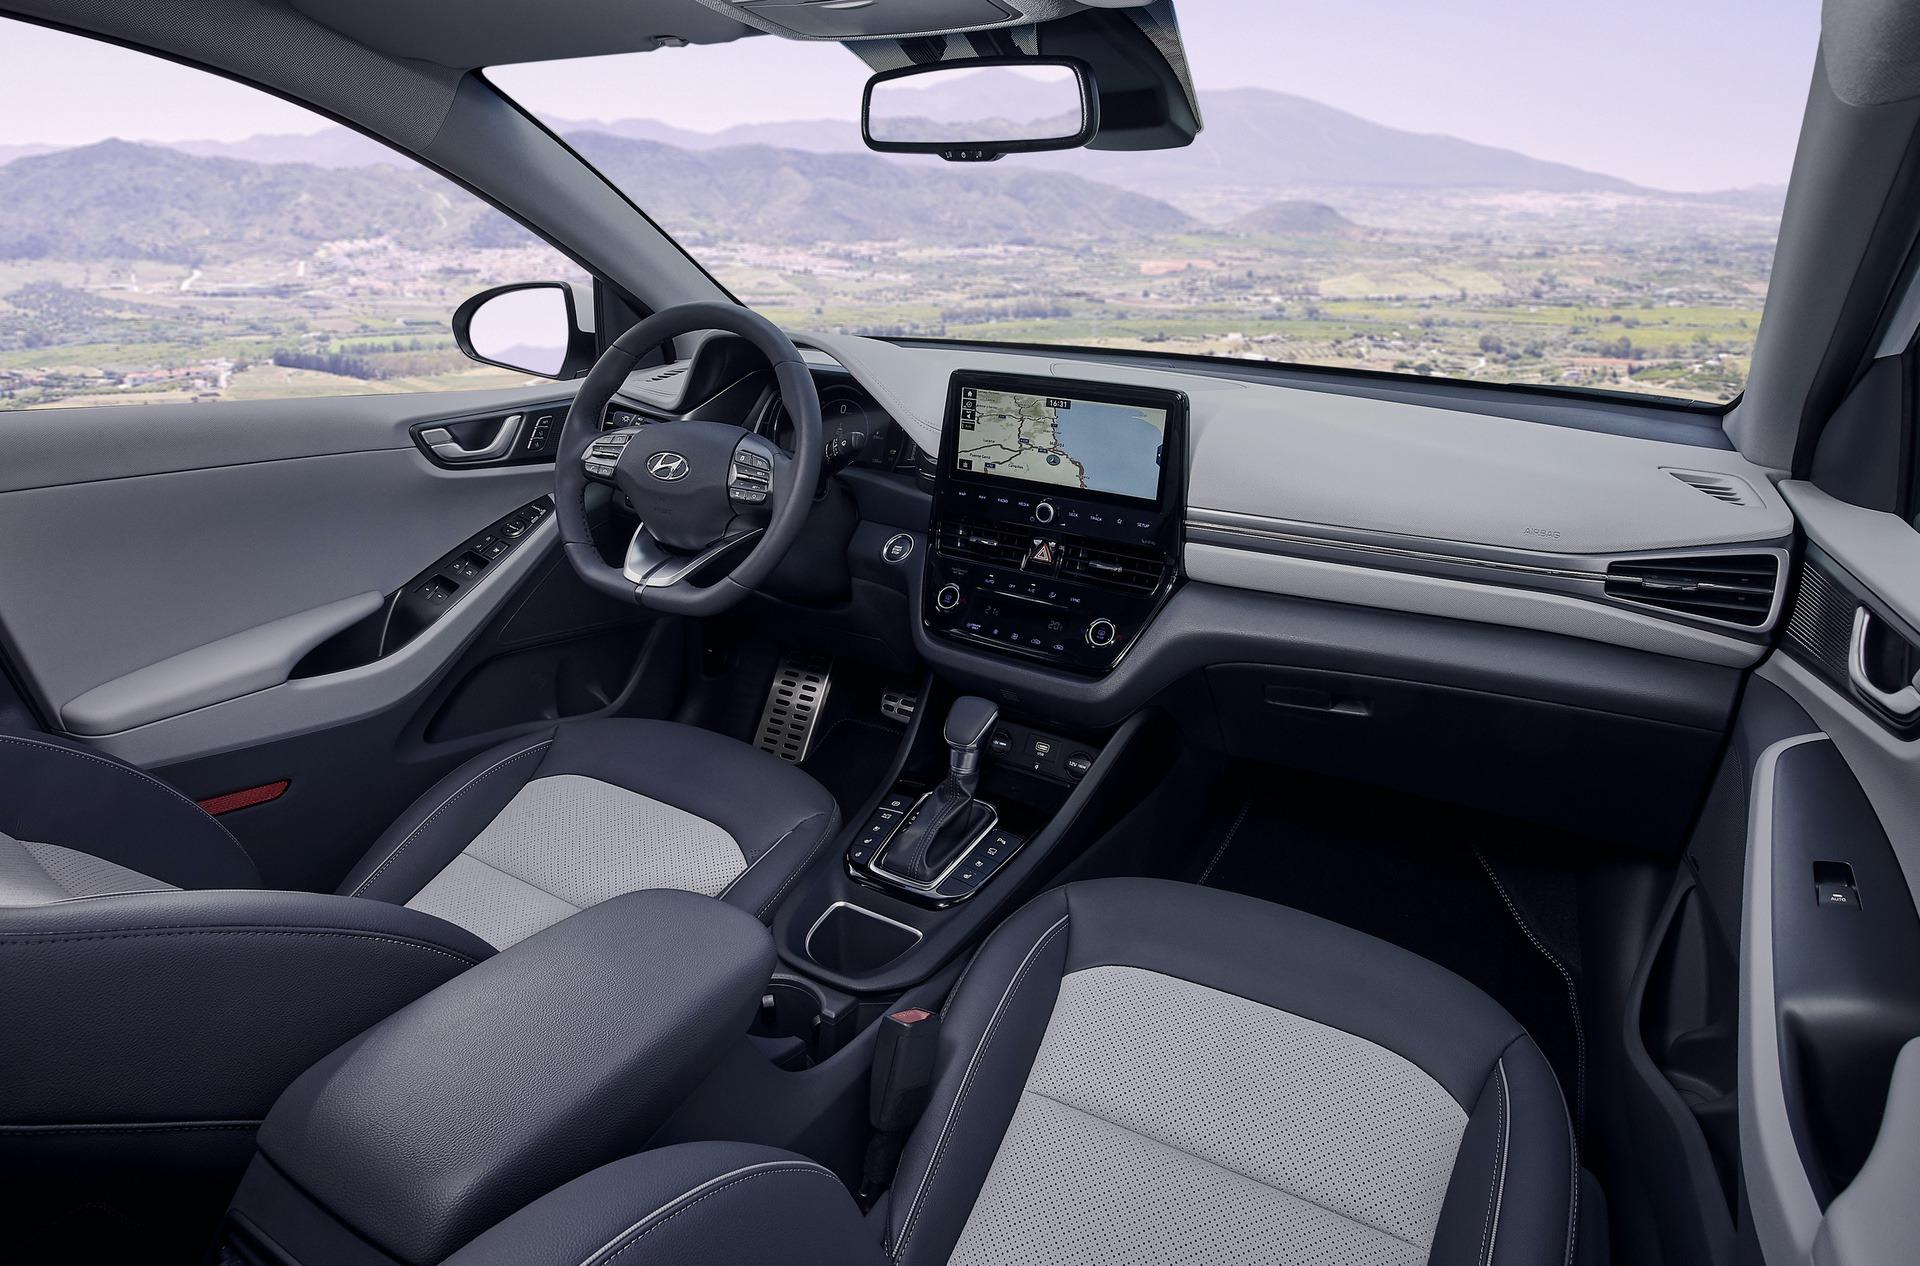 New-Hyundai-IONIQ-Hybrid-Interior-1